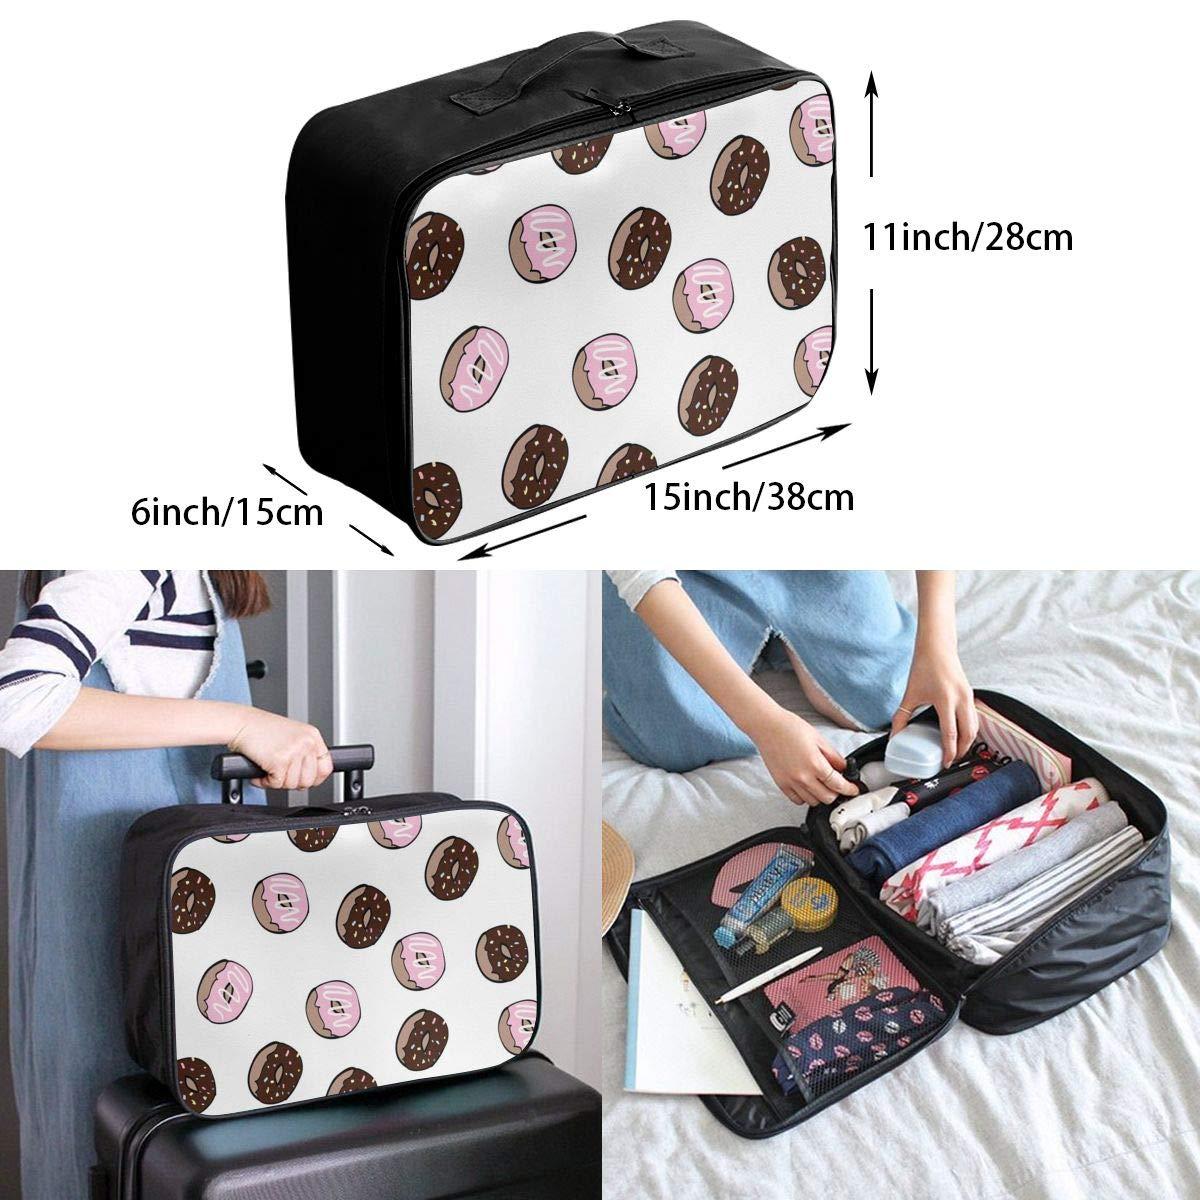 Travel Luggage Duffle Bag Lightweight Portable Handbag Doughnut Large Capacity Waterproof Foldable Storage Tote